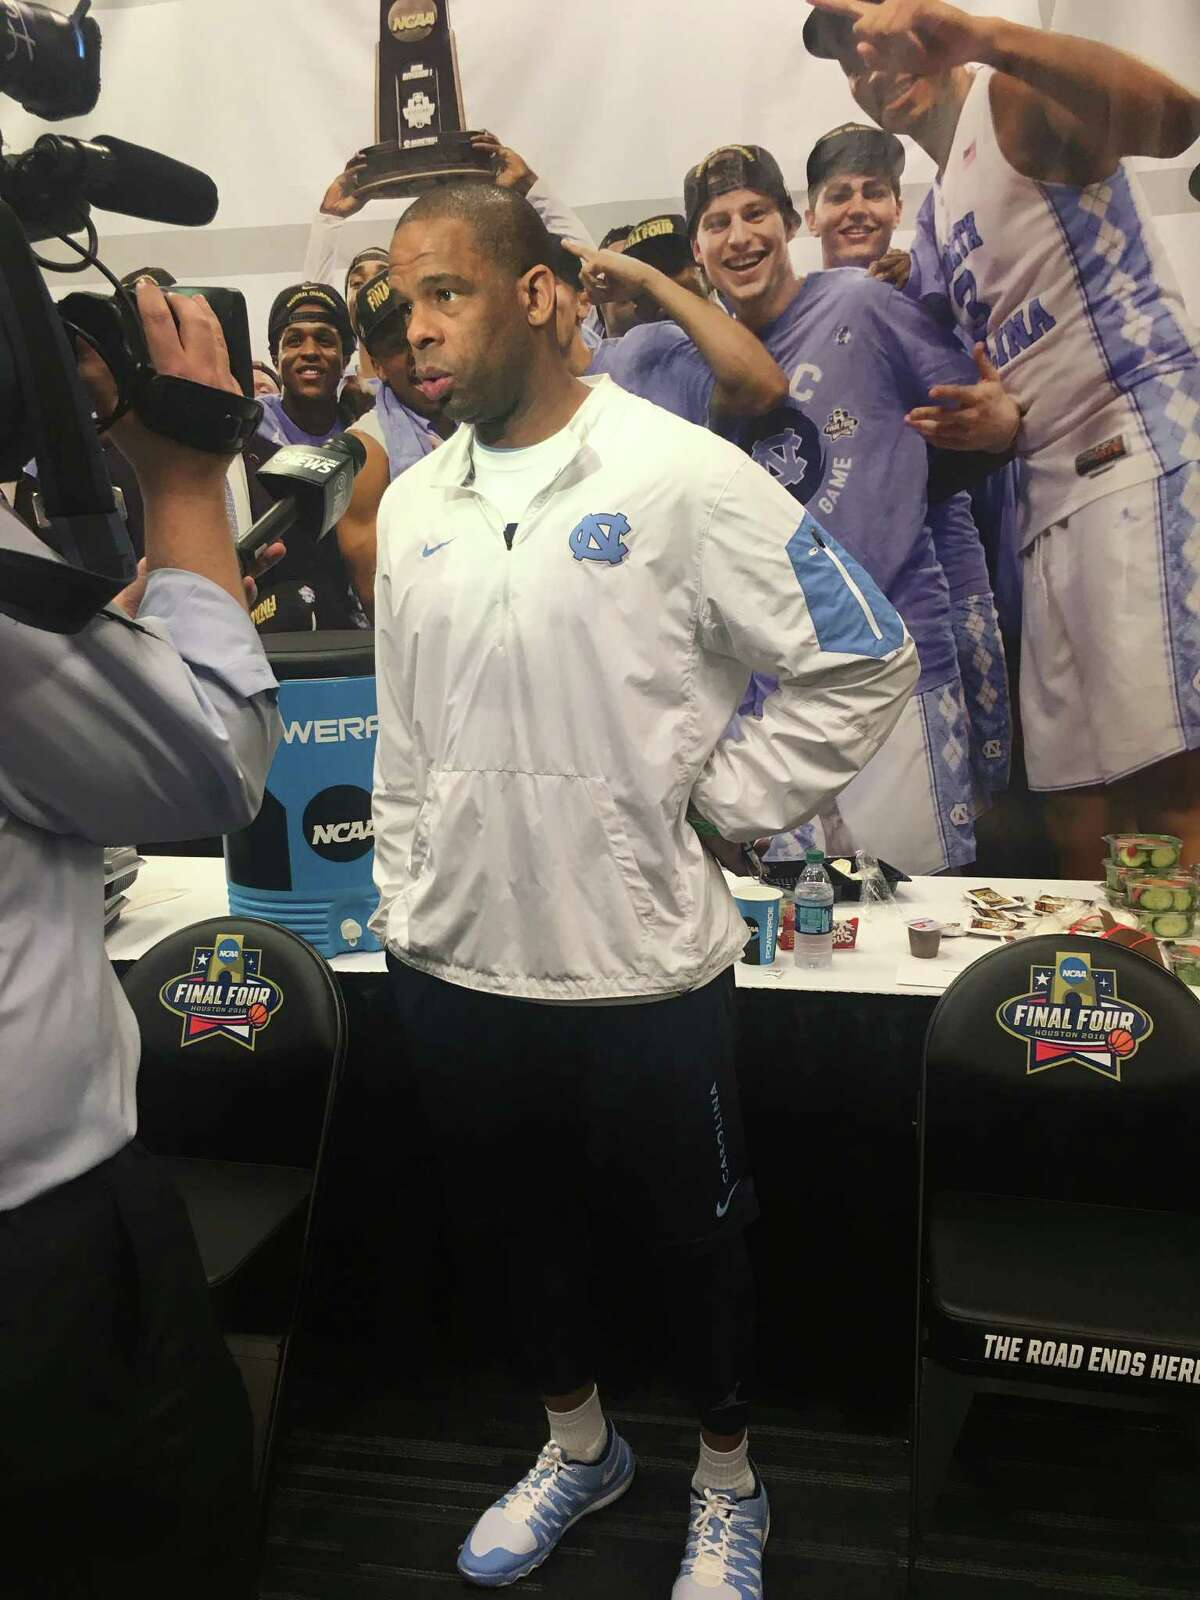 Former North Carolina star Hubert Davis talks to the media at the Final Four on Friday at NRG Stadium.